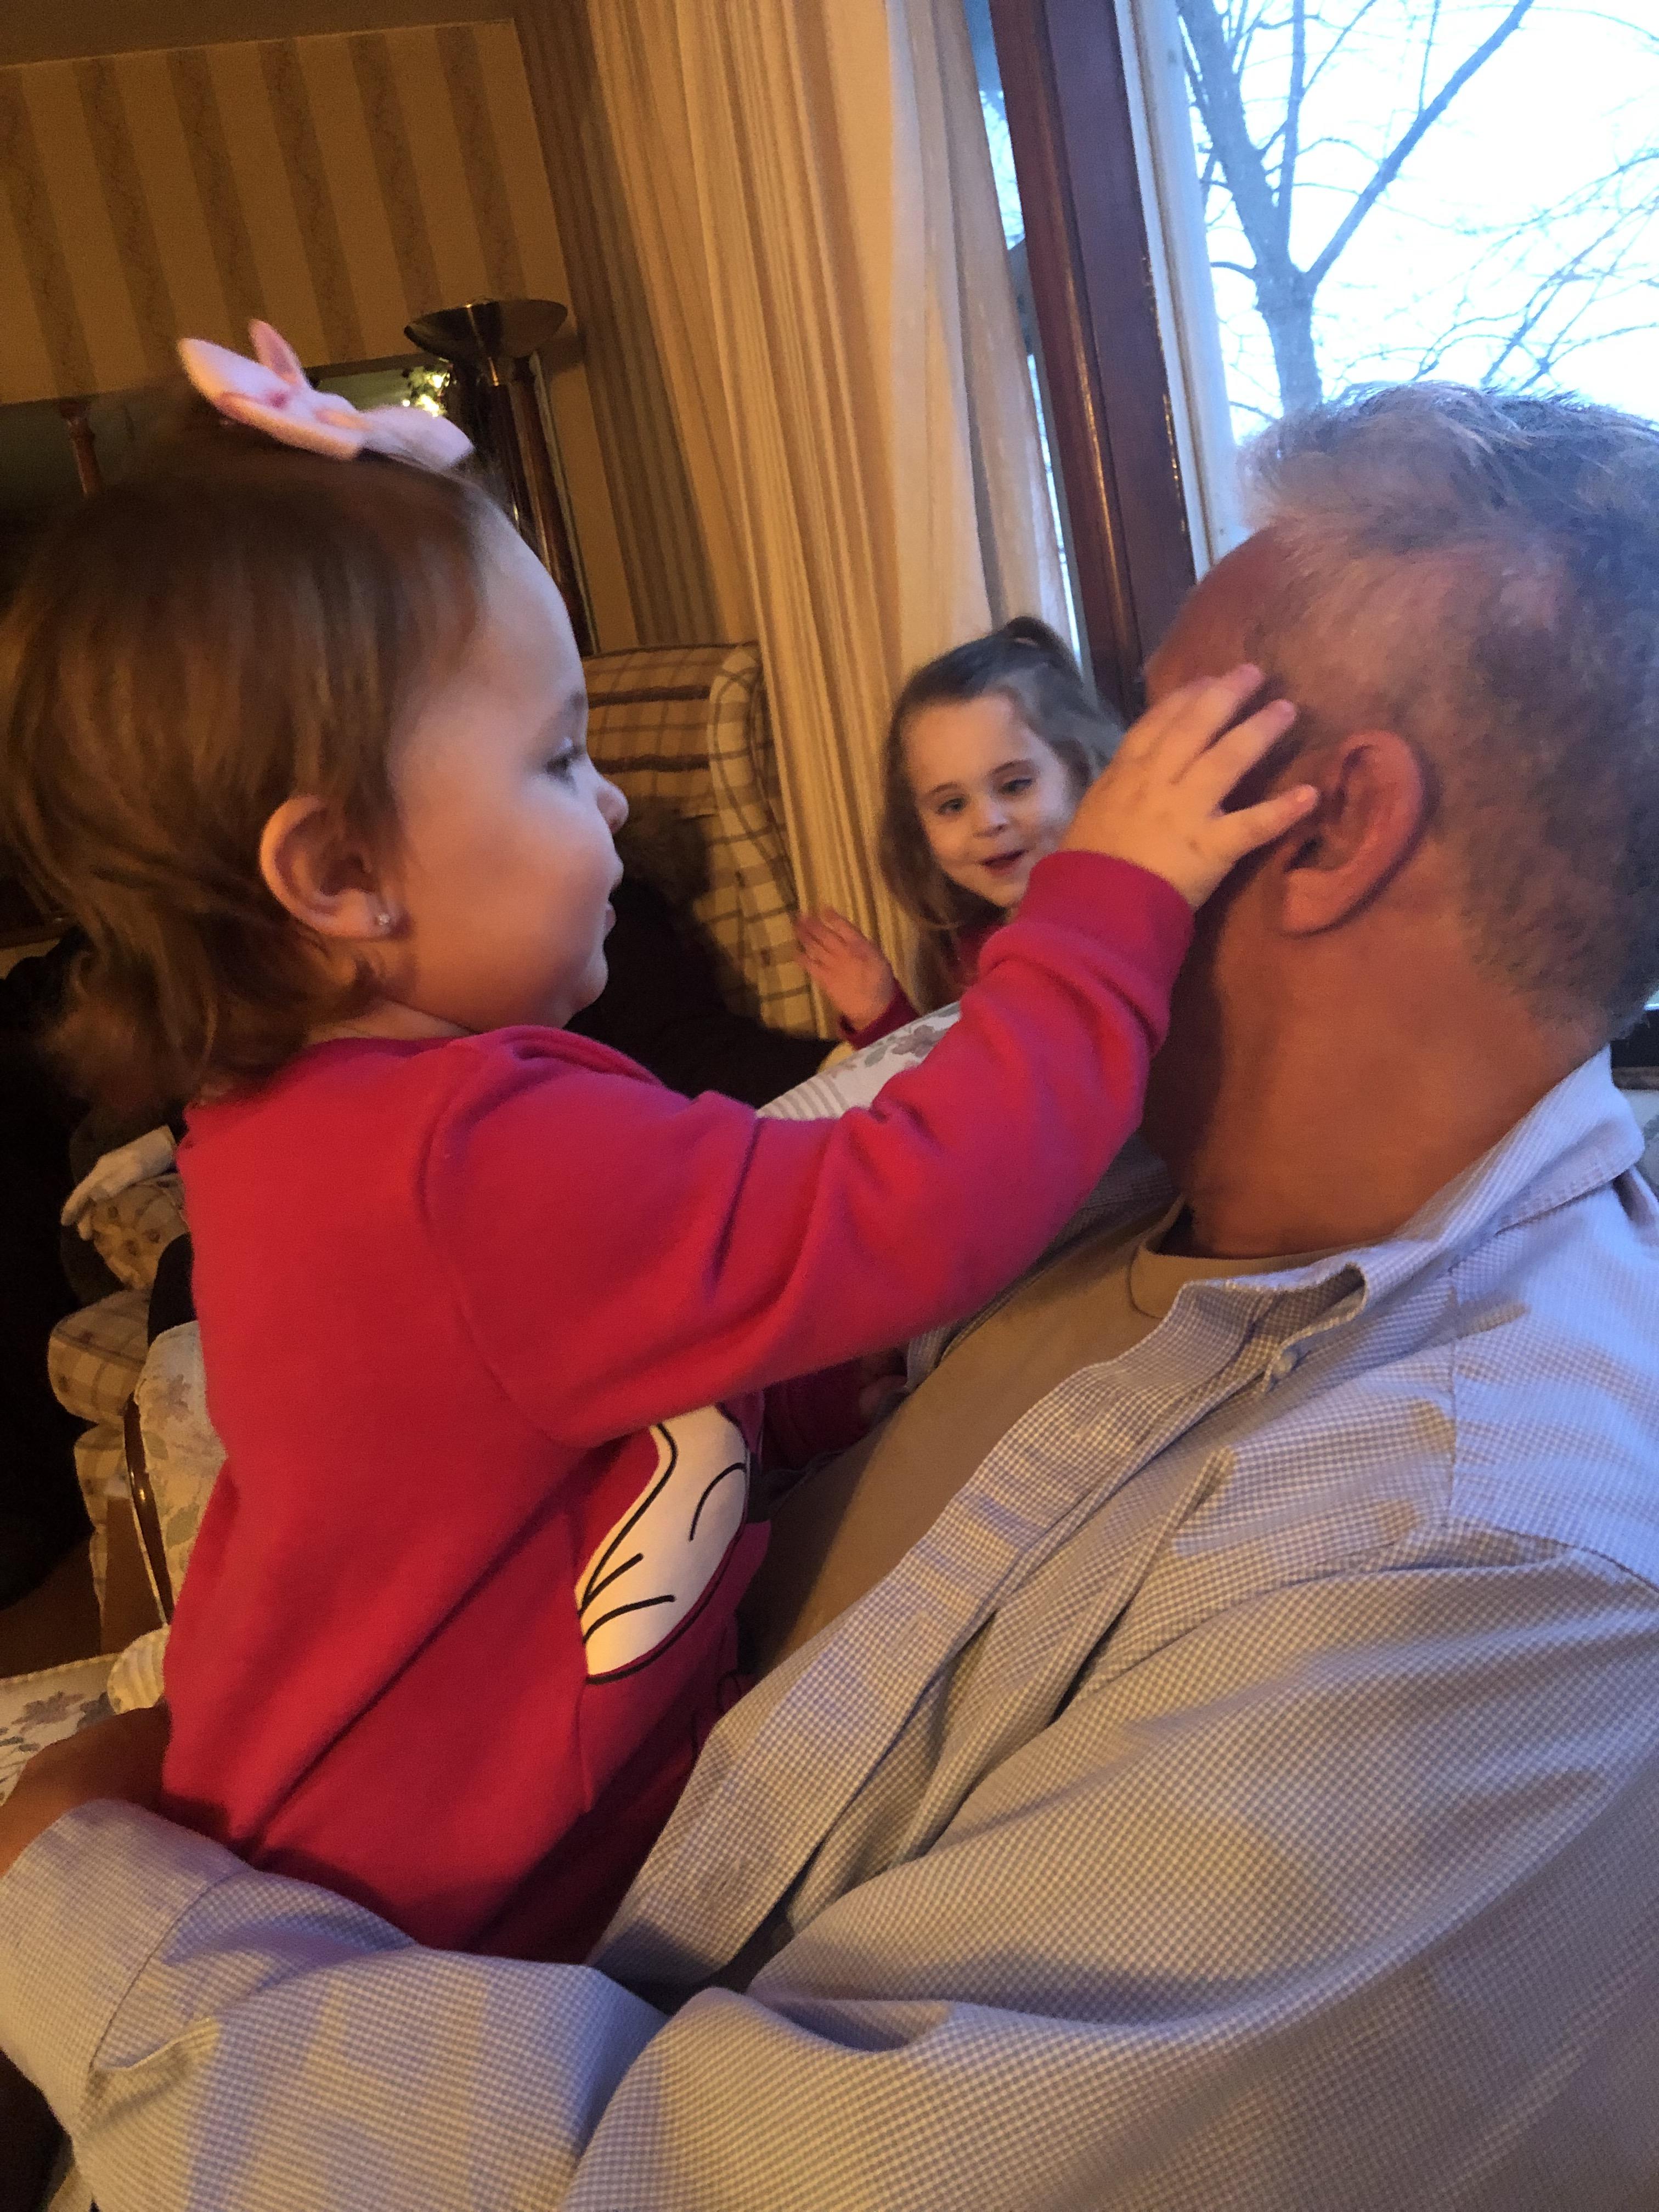 Aubrey touching papa's face